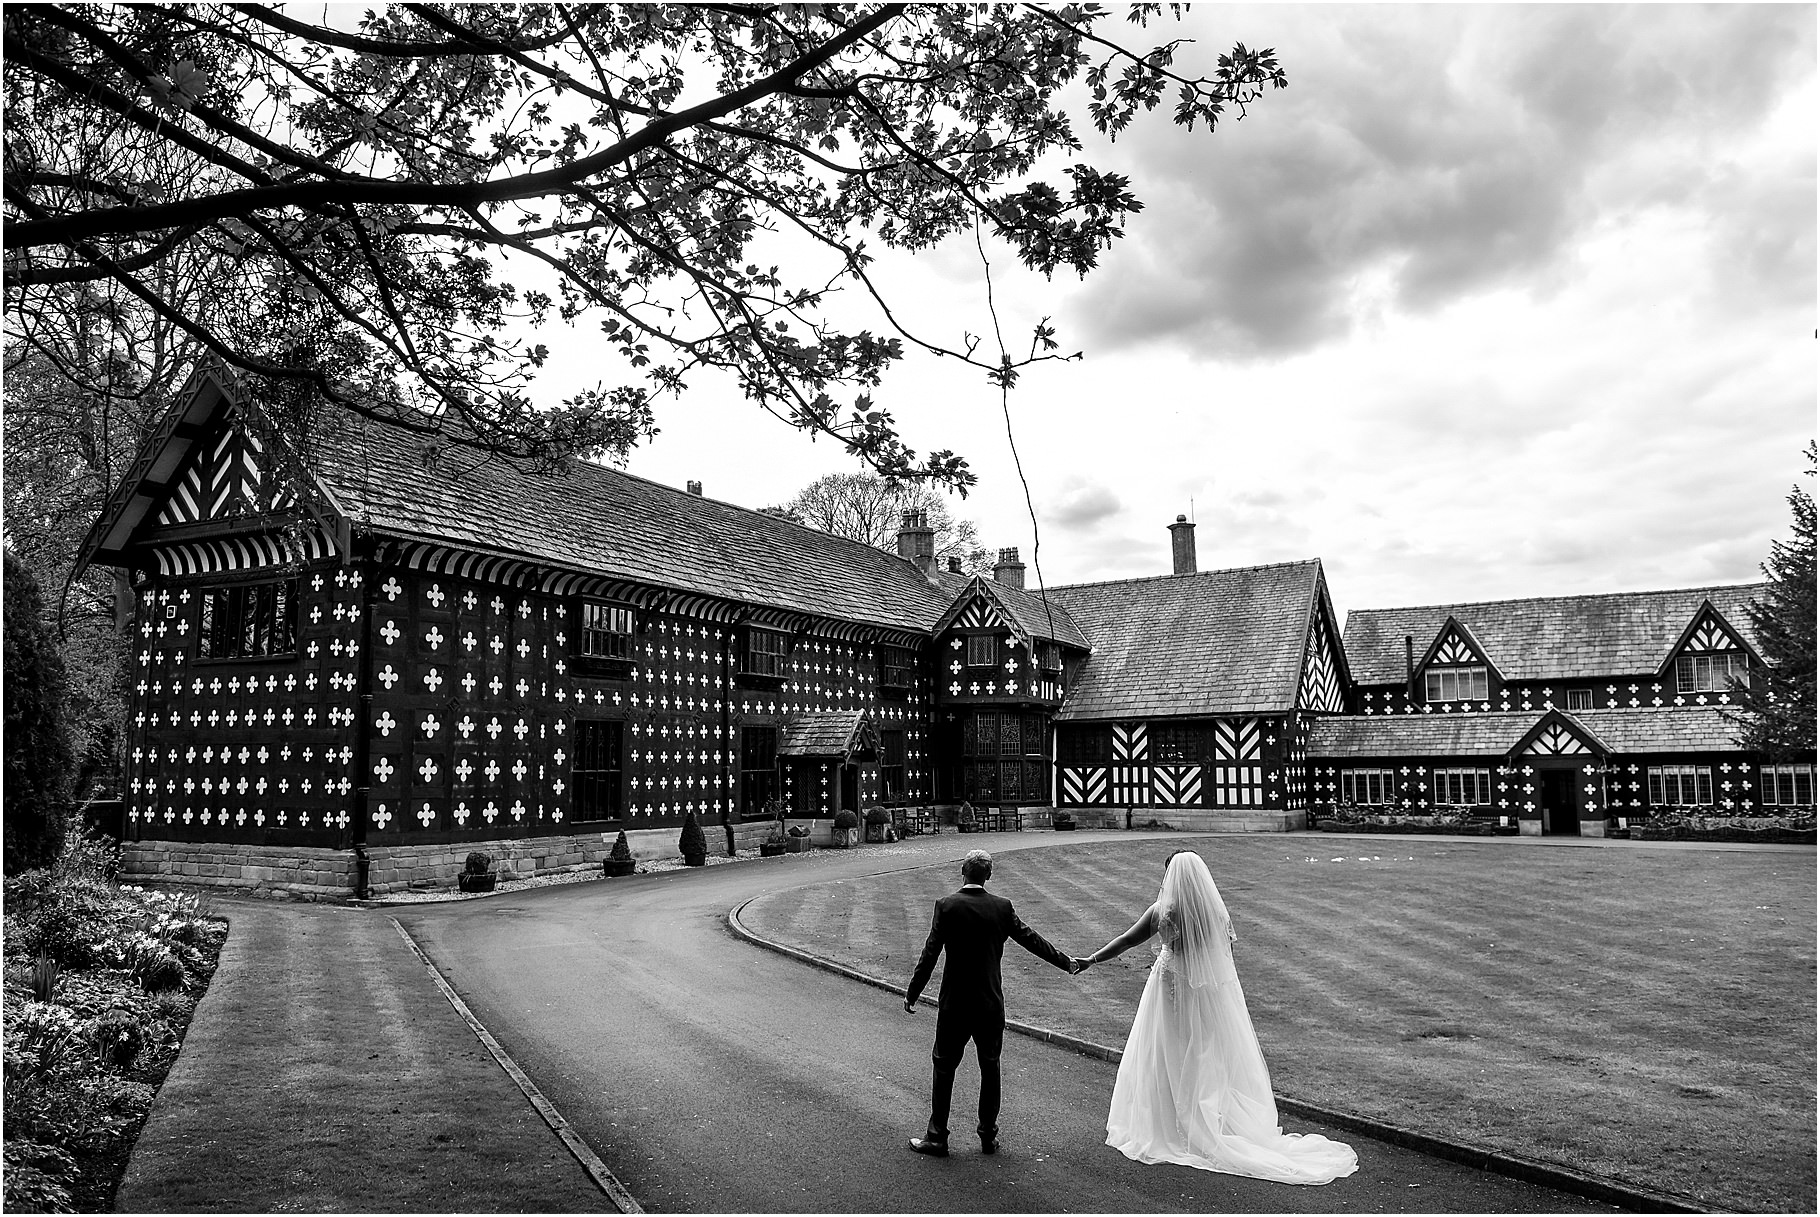 dan-wootton-photography-2017-weddings-159.jpg